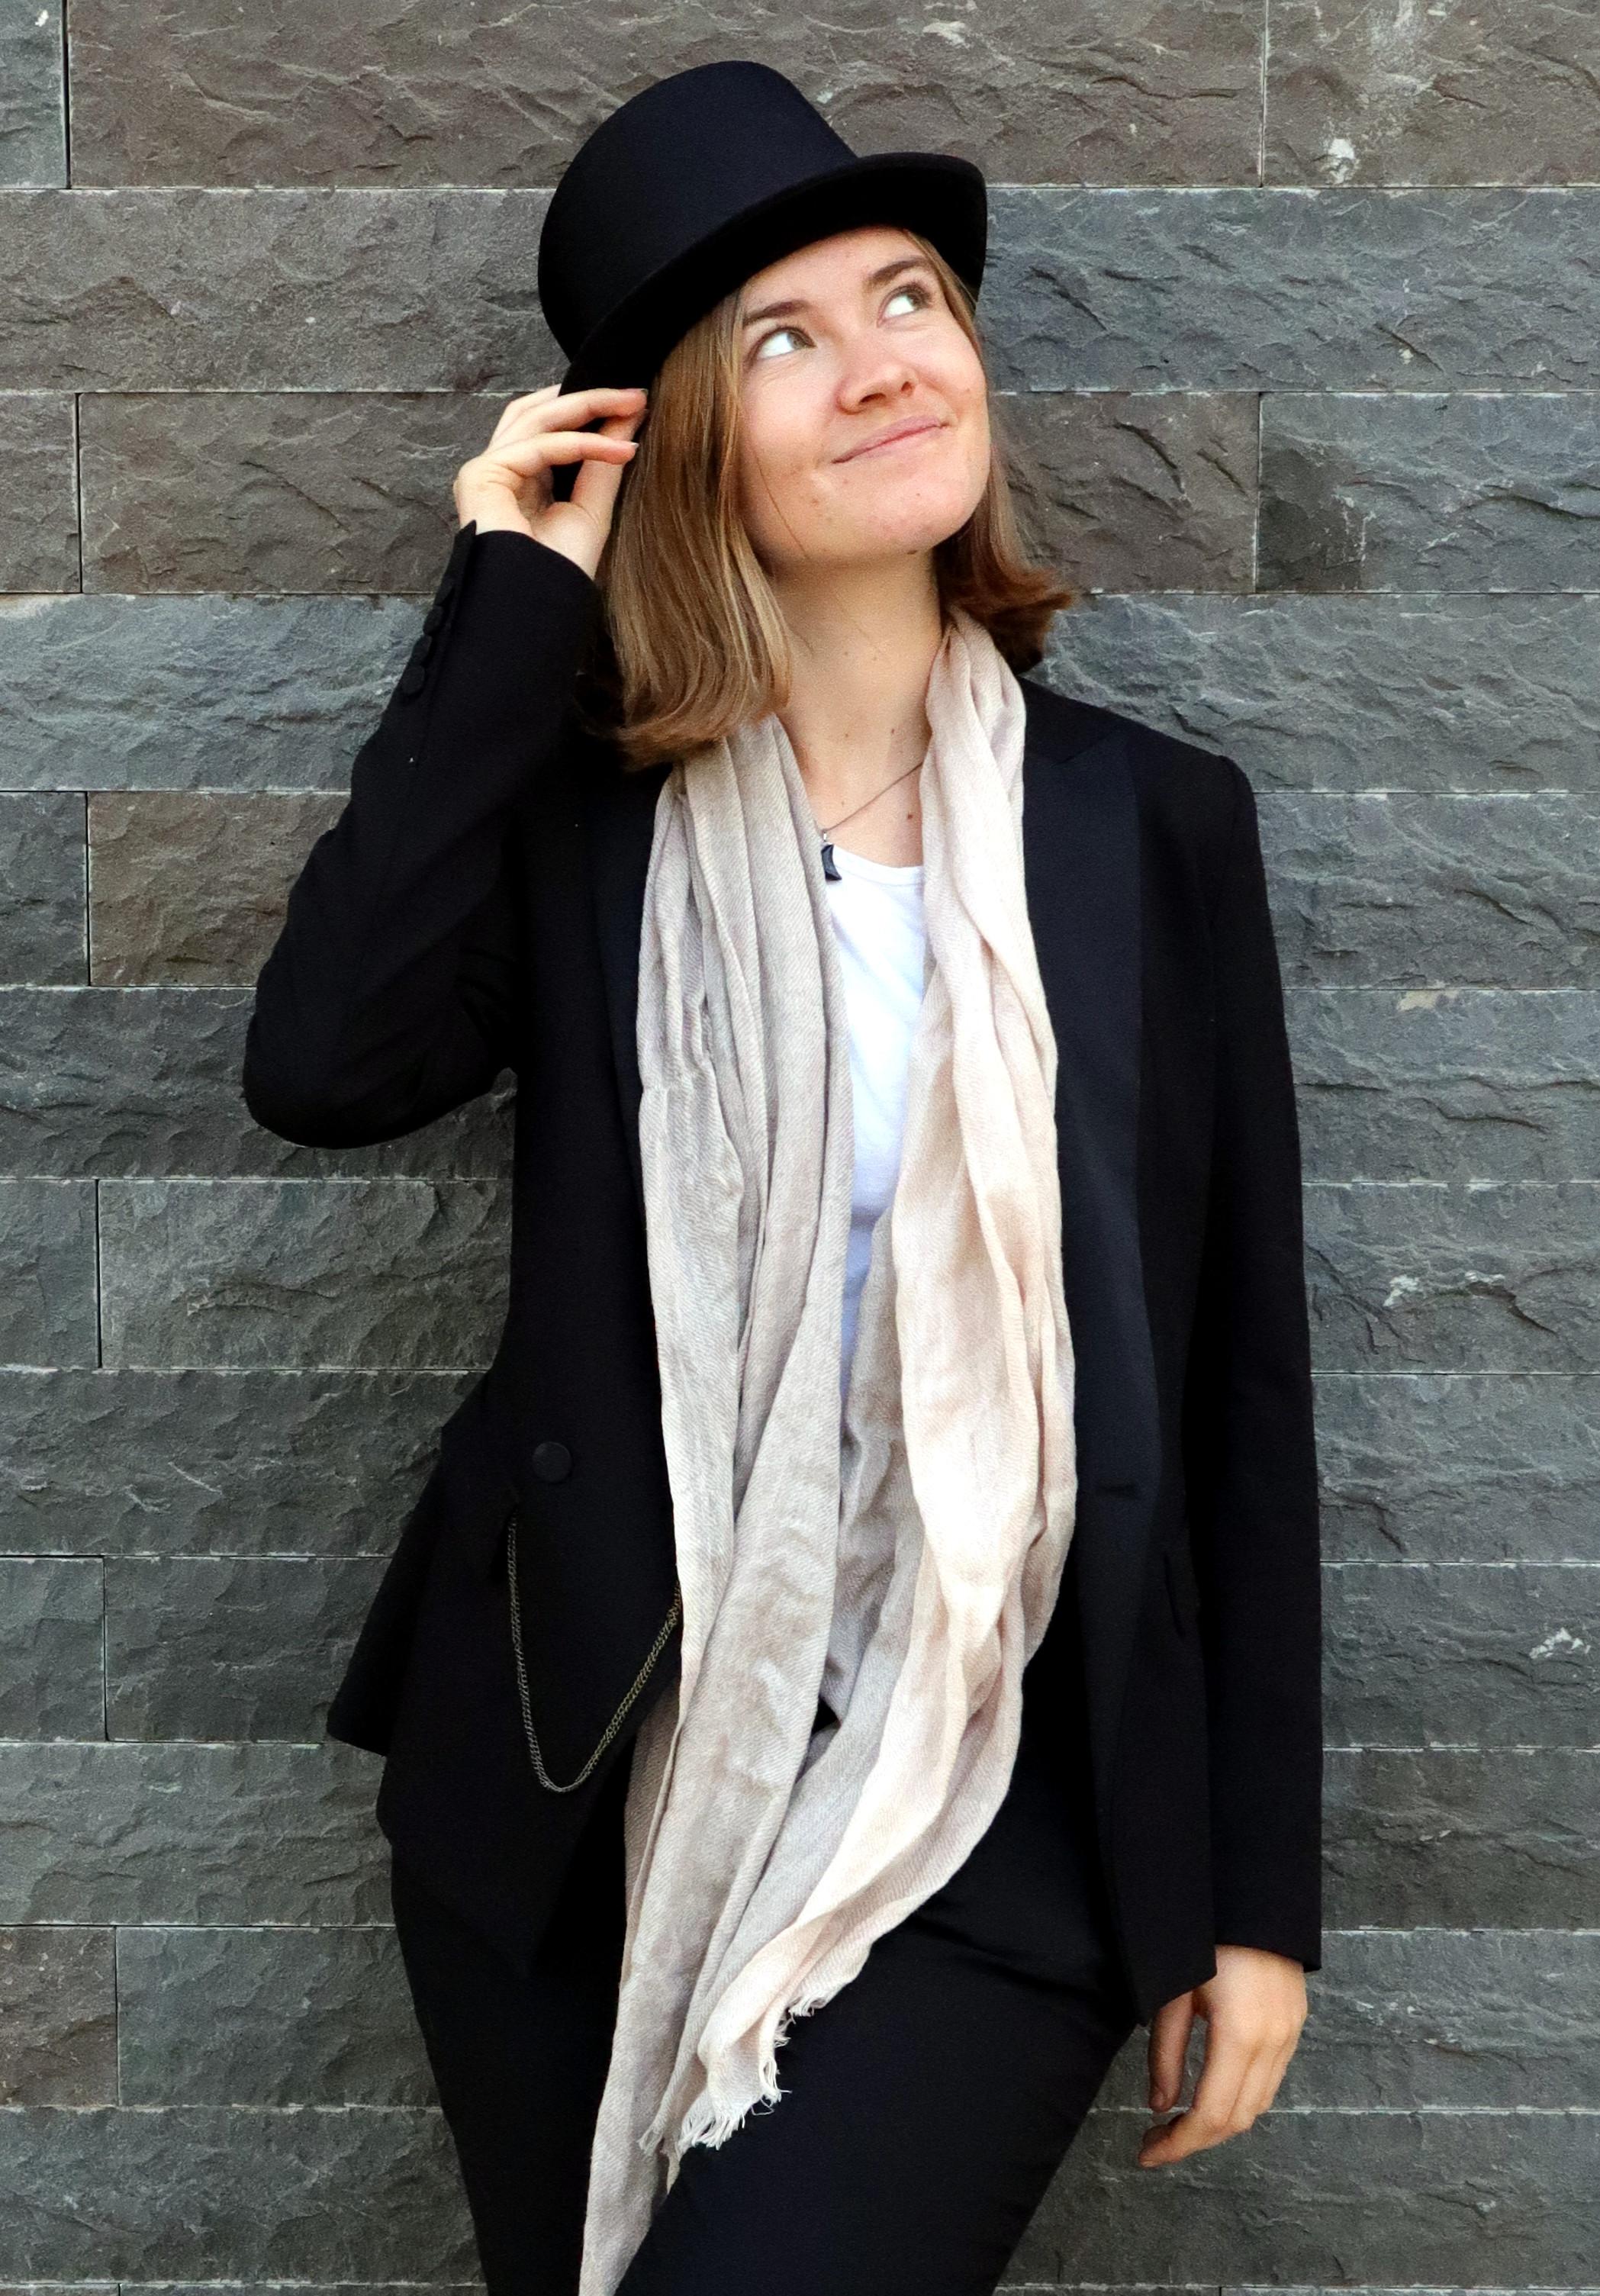 Luna Keller - Singer Songwriter - www.lunakeller.com